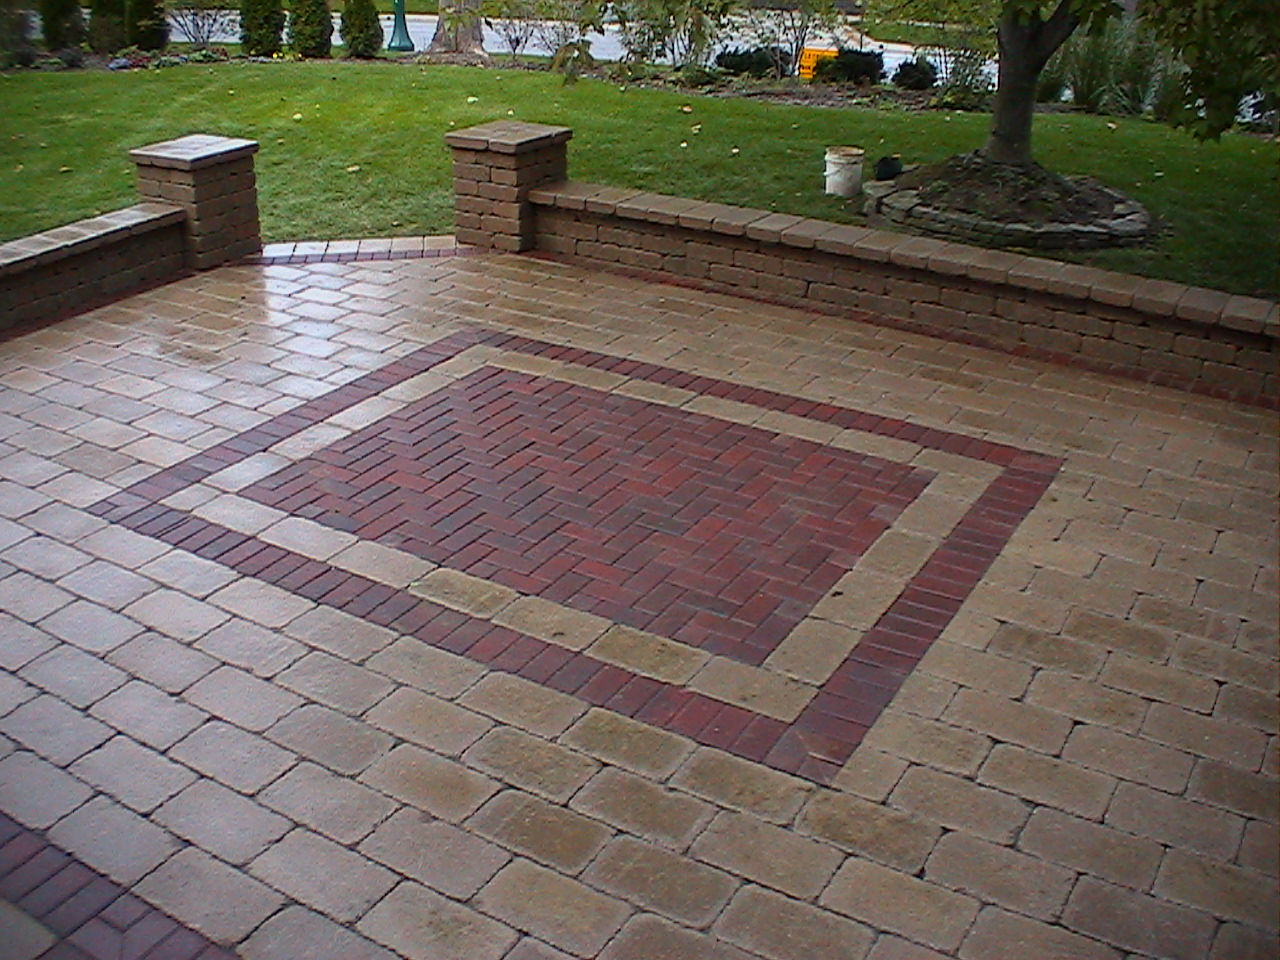 Fletcher 39 s custom design brick paving llc delaware oh for Brick designs